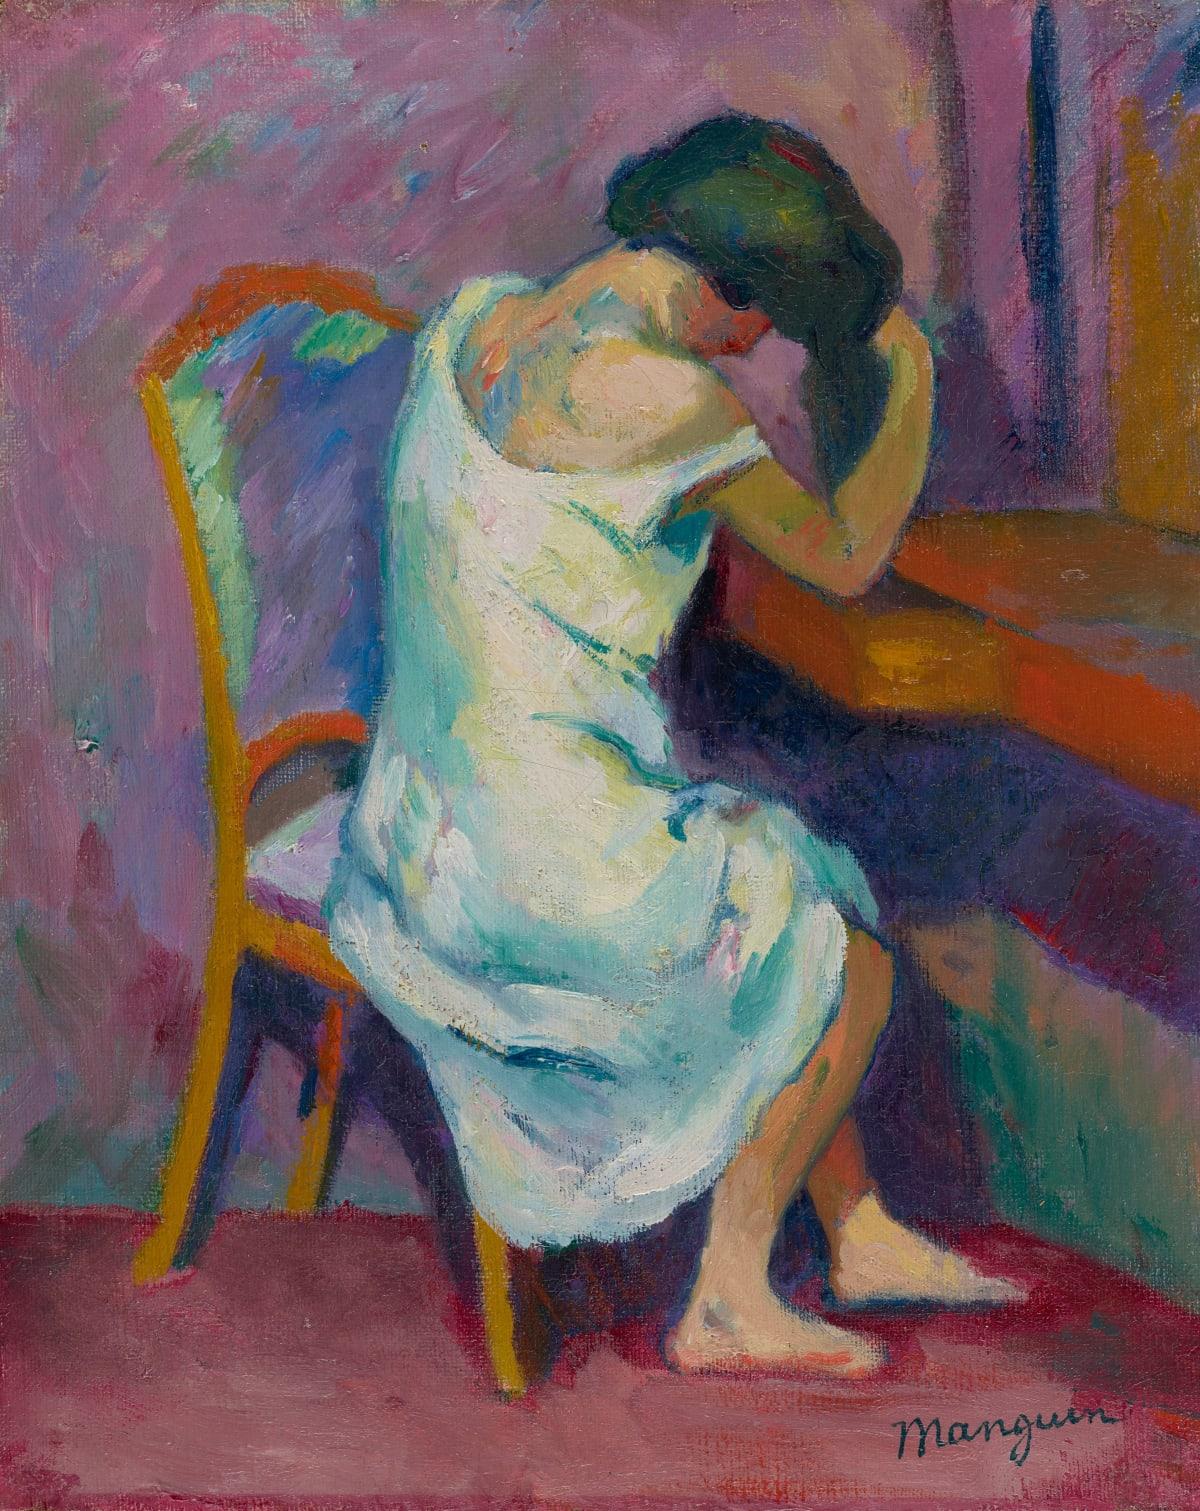 Henri-Charles Manguin, Jeanne à sa coiffeuse, 1904-05